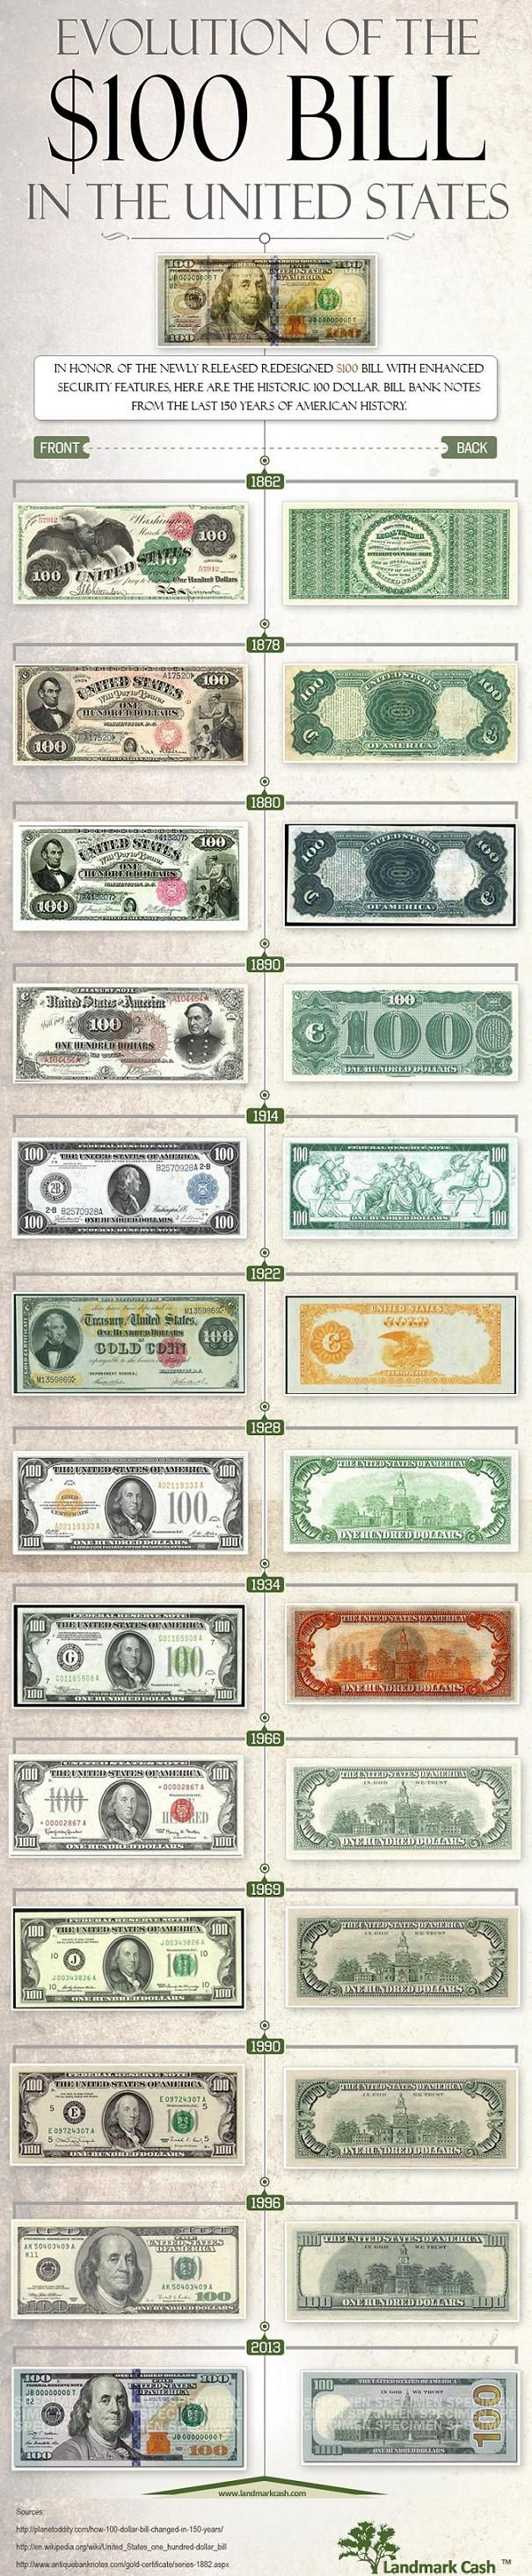 Evolution of the $100 bill.